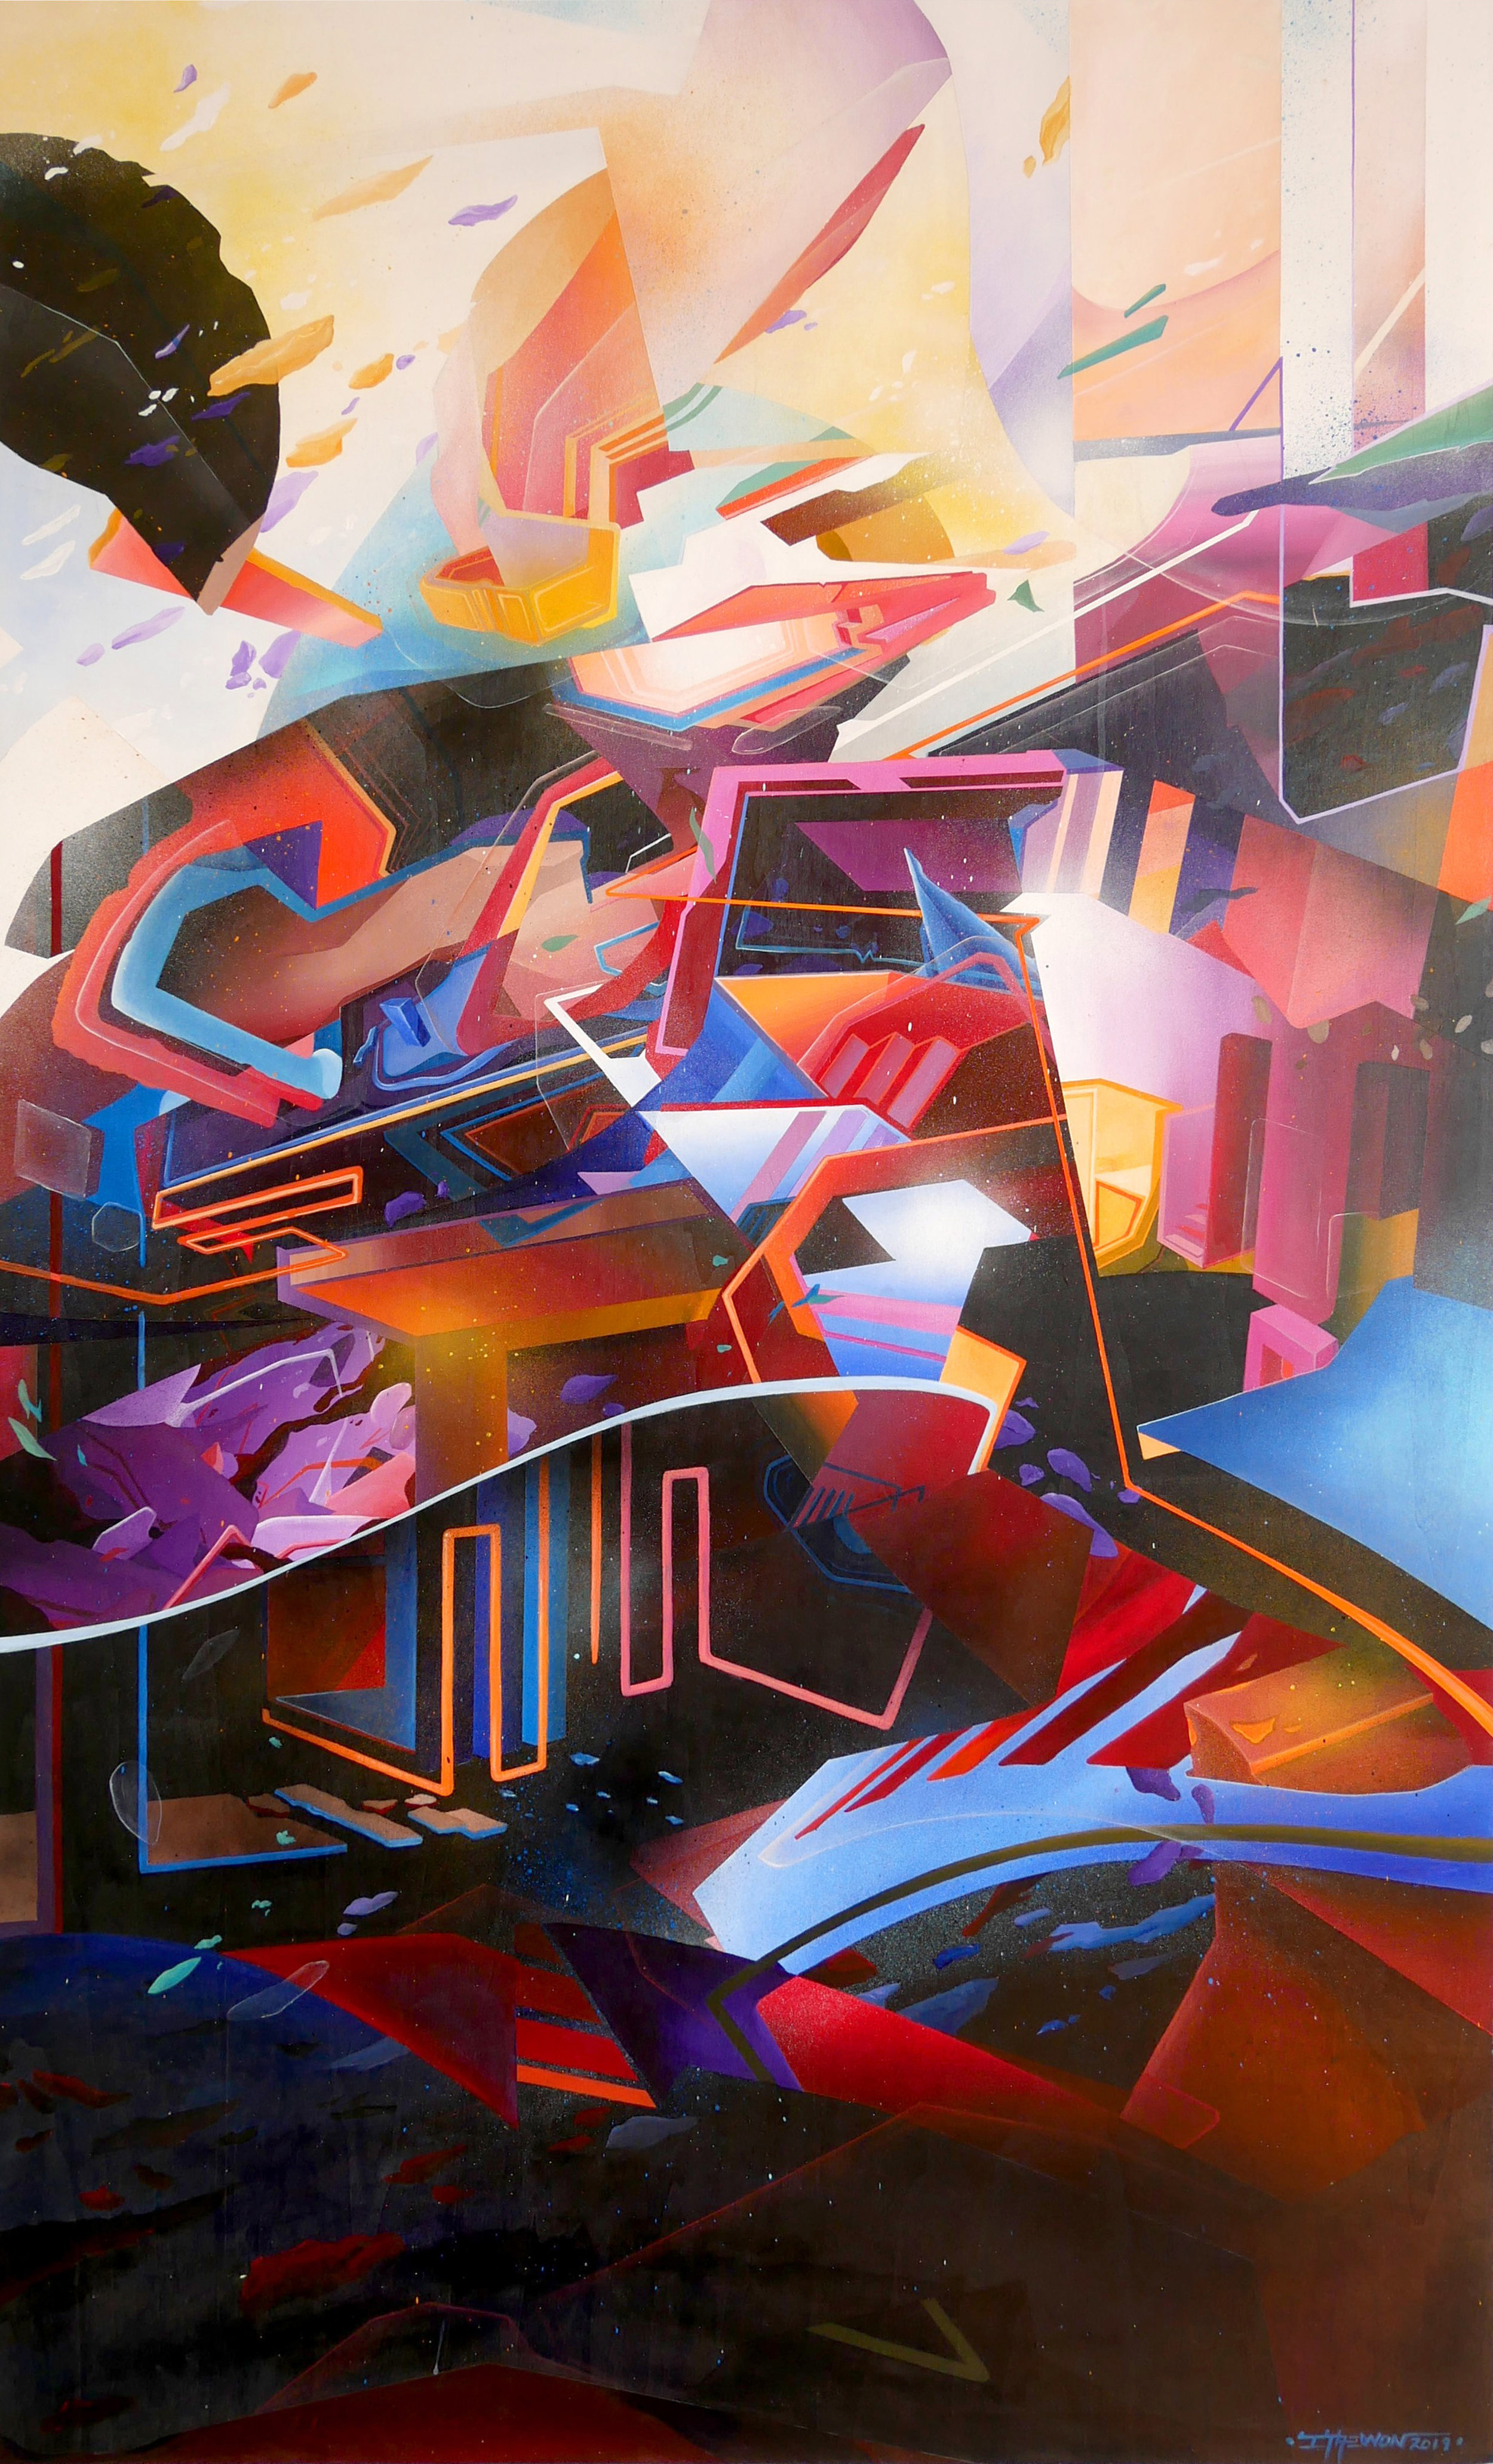 Epilogue 2 - 153cm x 90cm x 5cm - Acrylic and spray paint on wood  - 2019